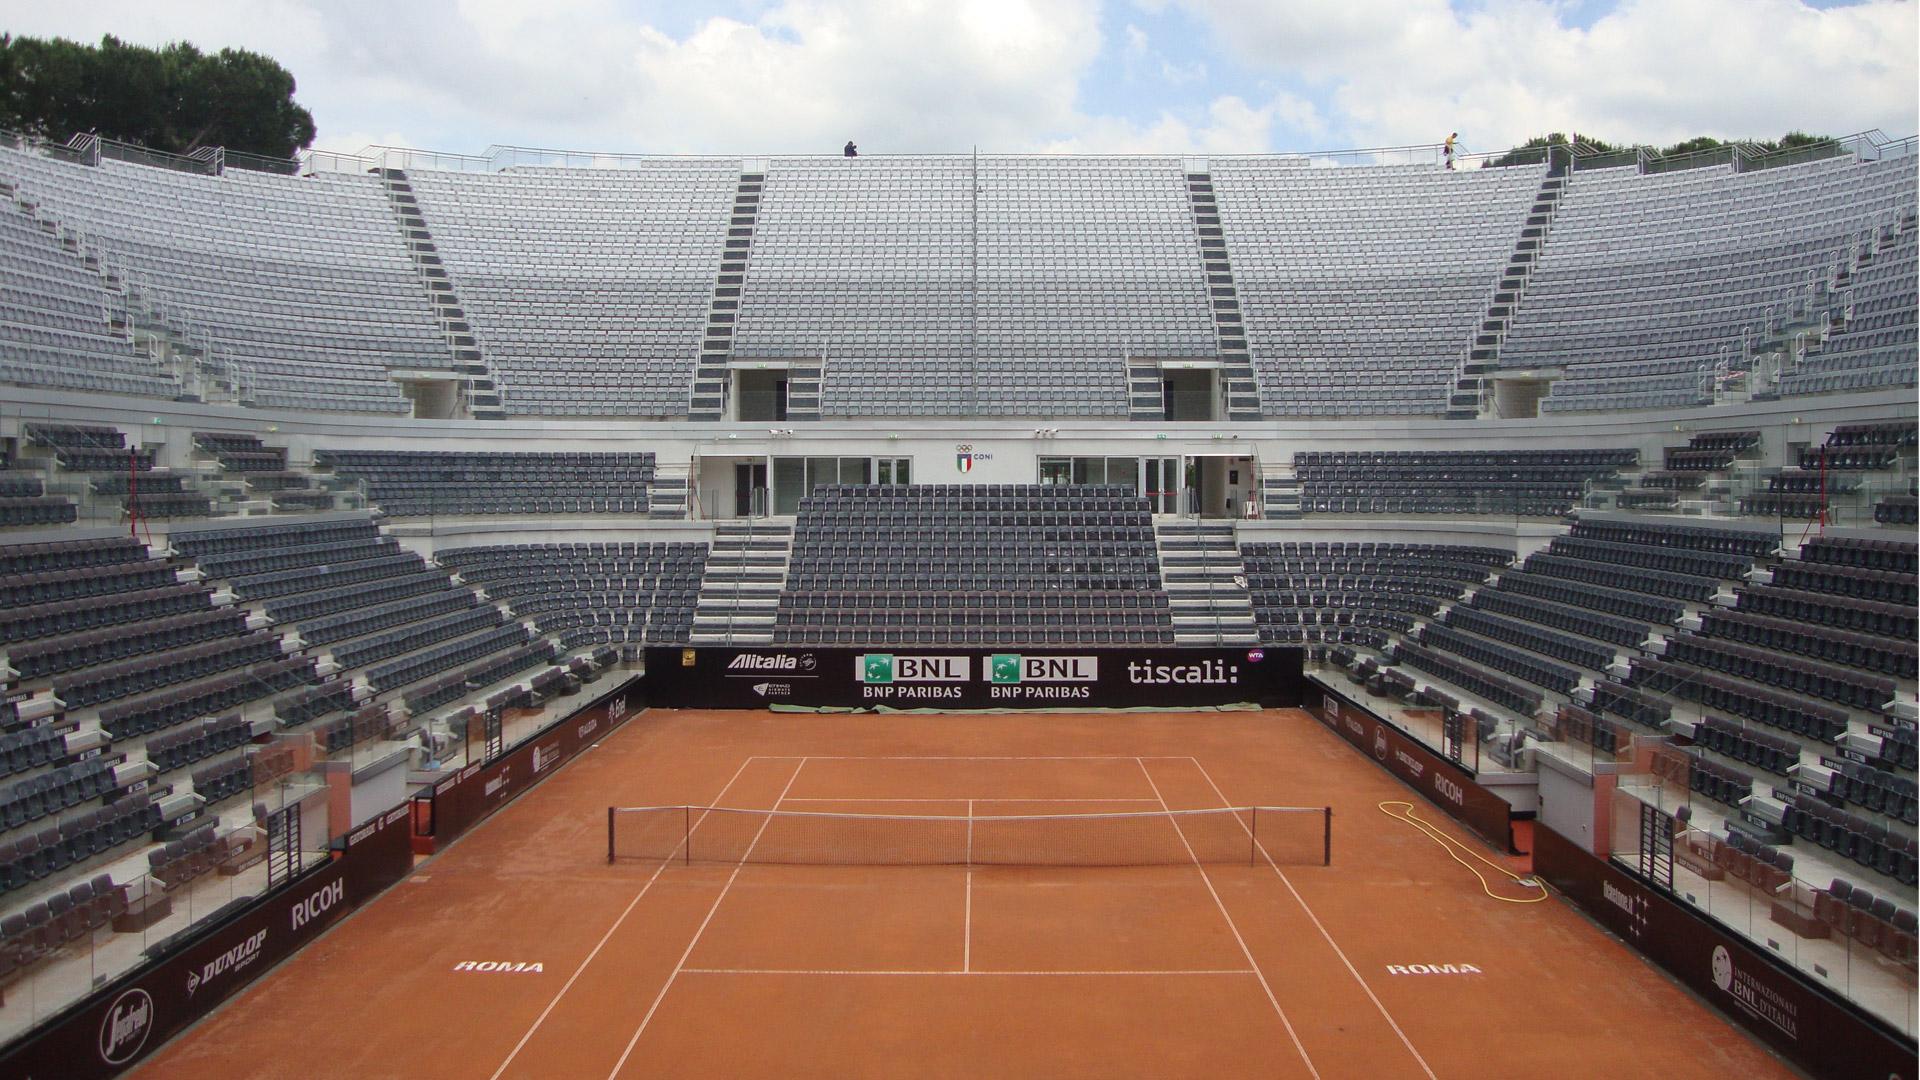 stadio centrale del tennis roma metal engineering carpenteria metallica pesante e leggera. Black Bedroom Furniture Sets. Home Design Ideas